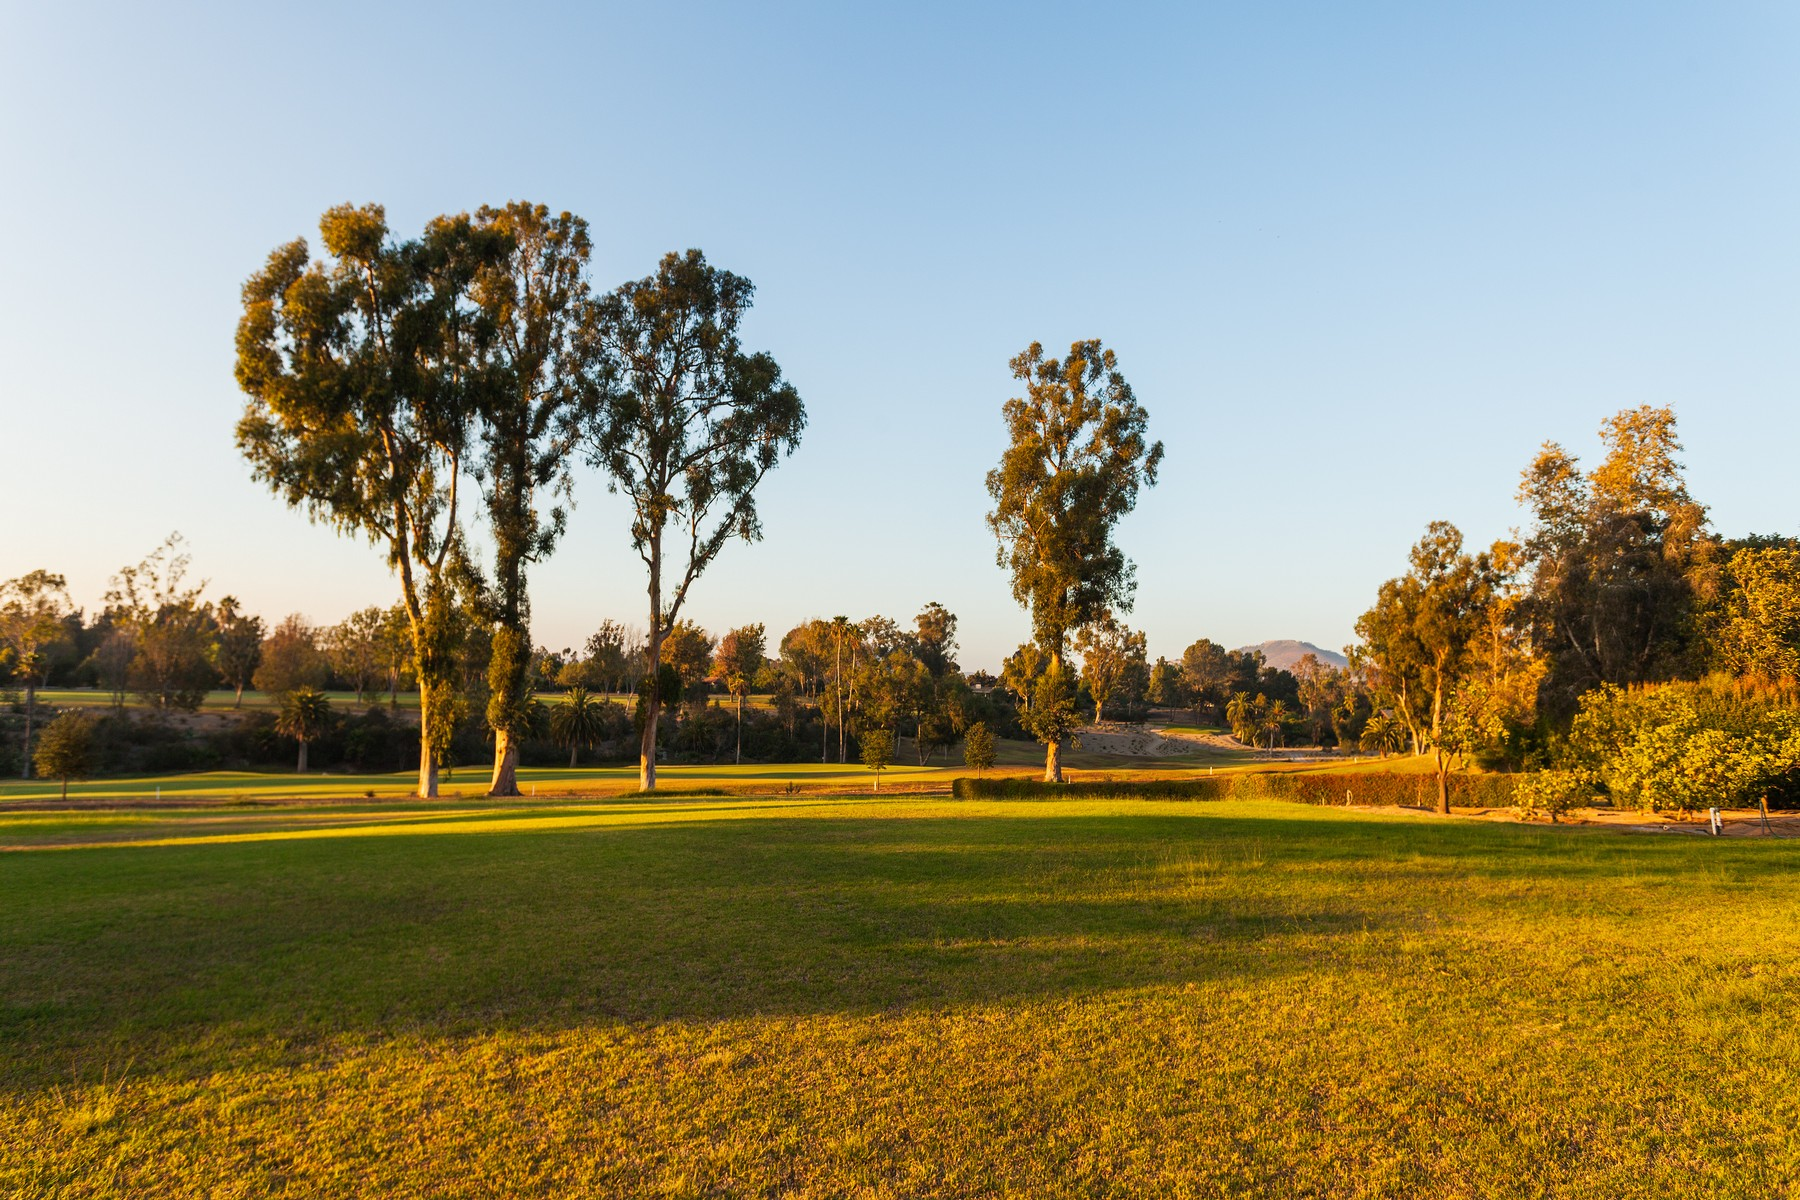 独户住宅 为 销售 在 6380 Paseo Delicias Rancho Santa Fe, 加利福尼亚州 92067 美国